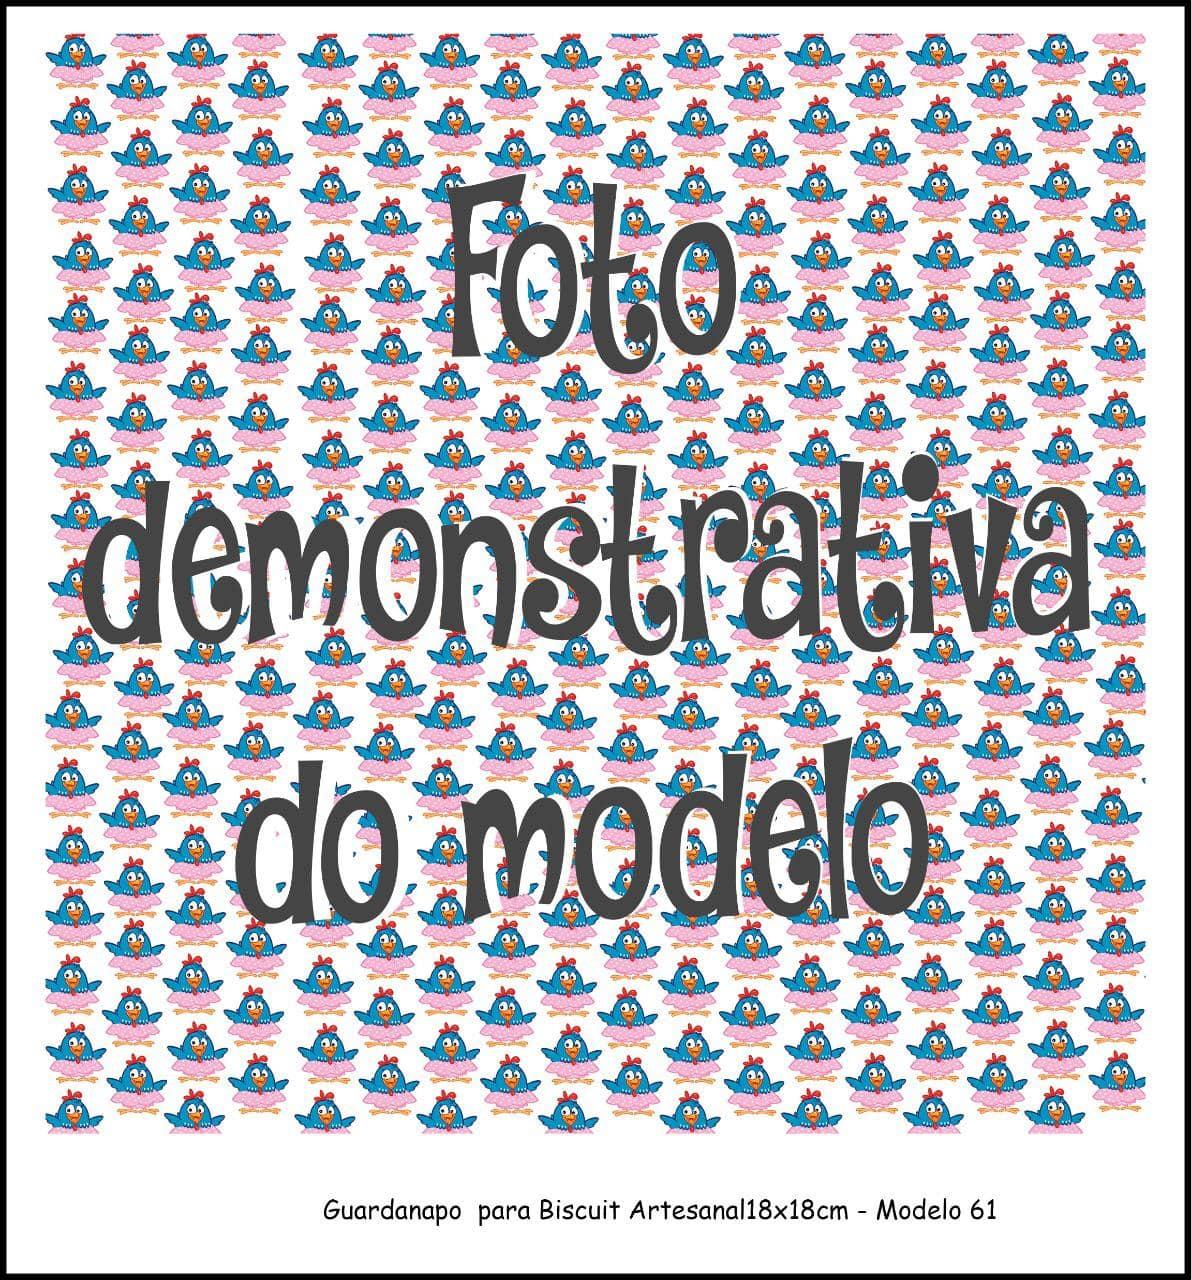 GUARDANAPO ARTESANAL - MODELO 61 - 18x18 cm